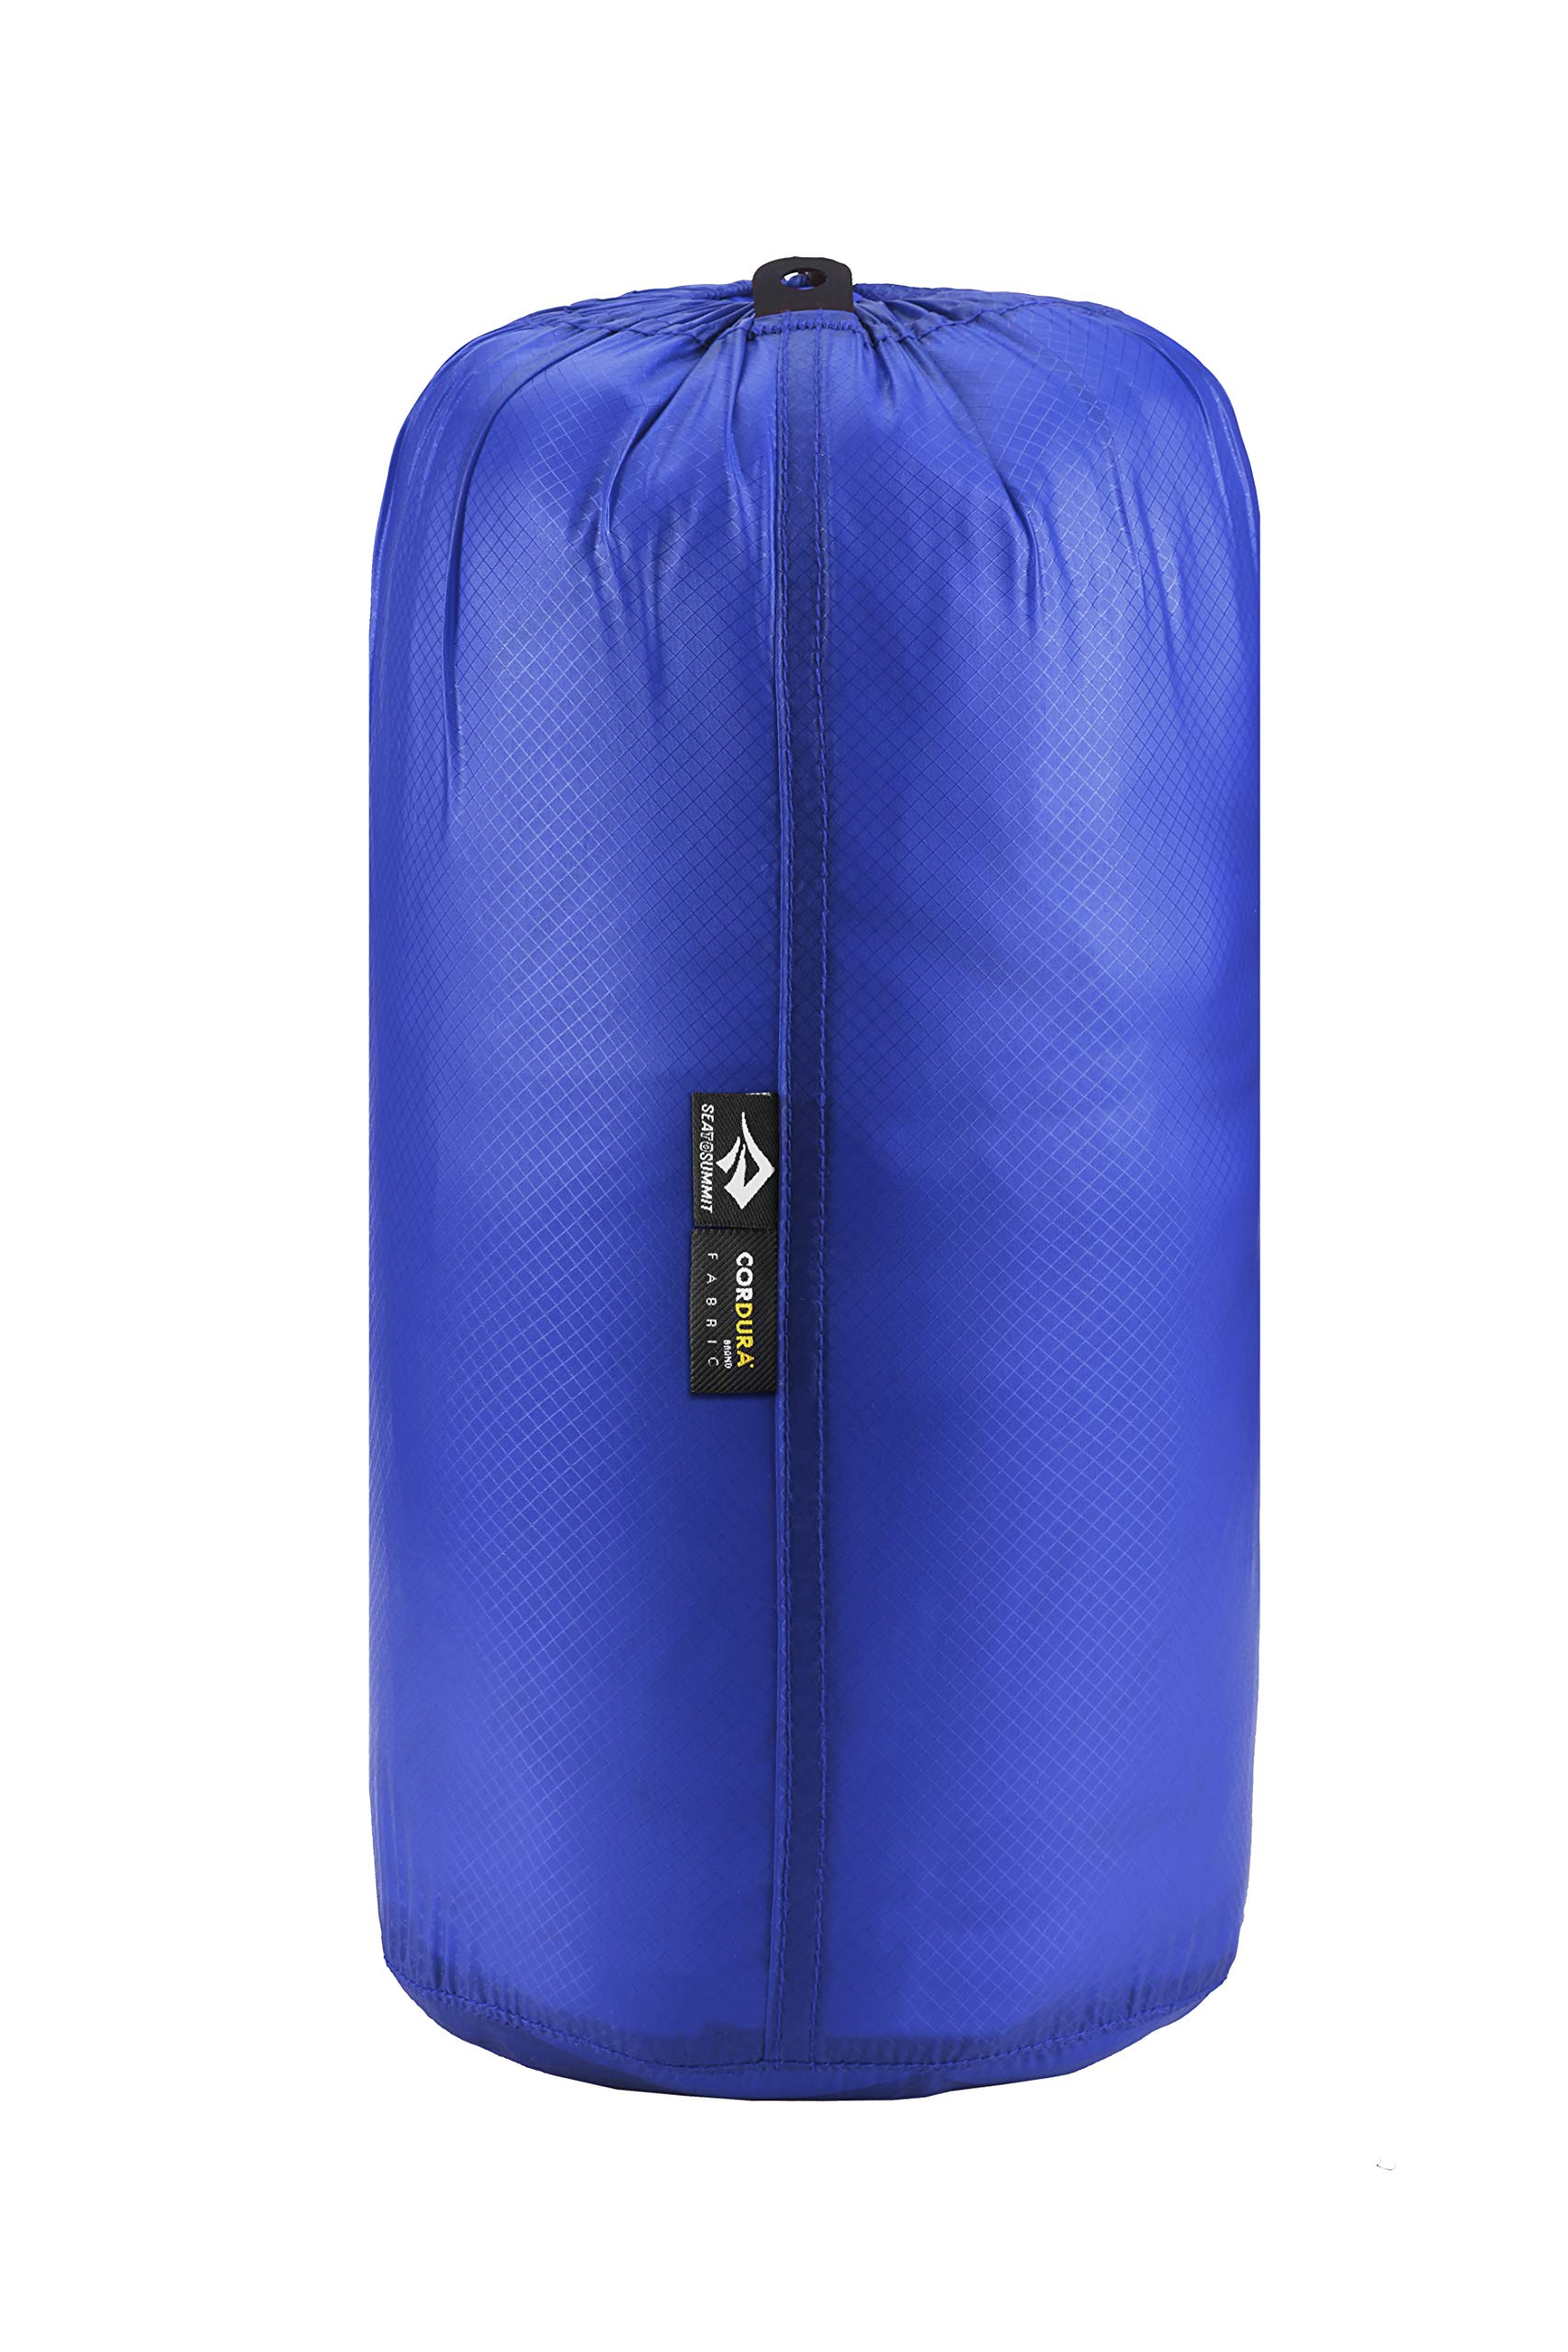 Sea to Summit Ultra-SIL Stuff Sack, Royal Blue, 9 Liter by Sea to Summit